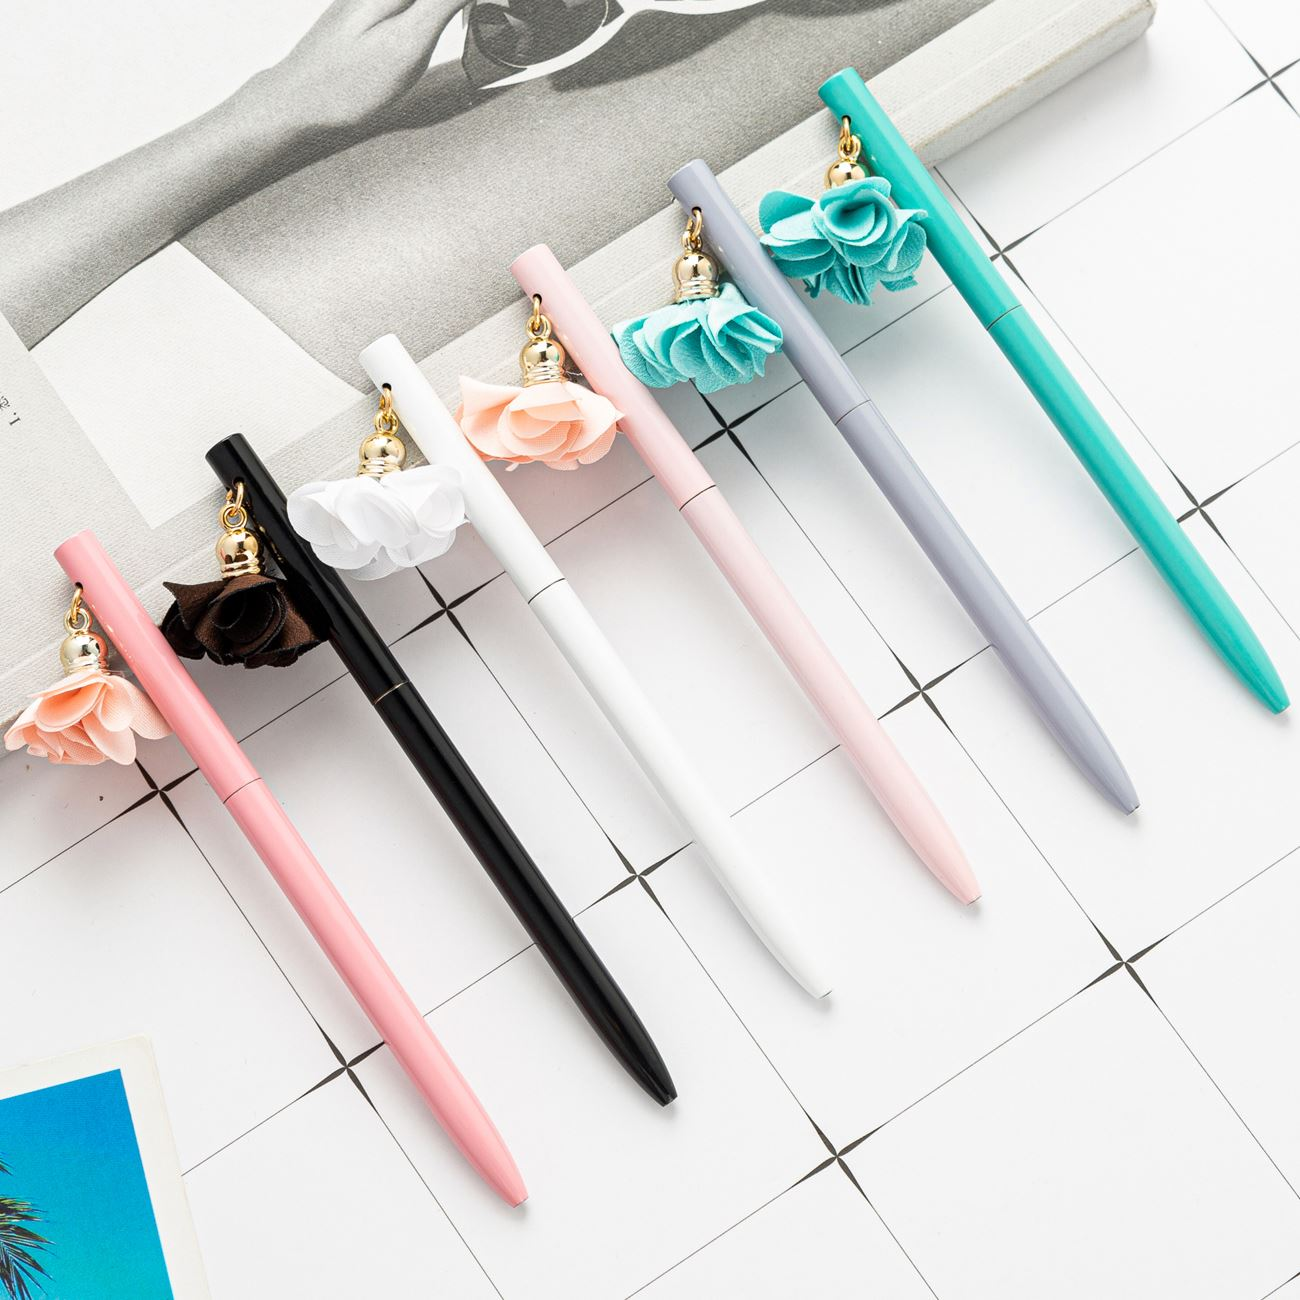 New design novelty metal  ballpoint pen with DIY flower promotion custom logo colorful  ball pen foroffice /school